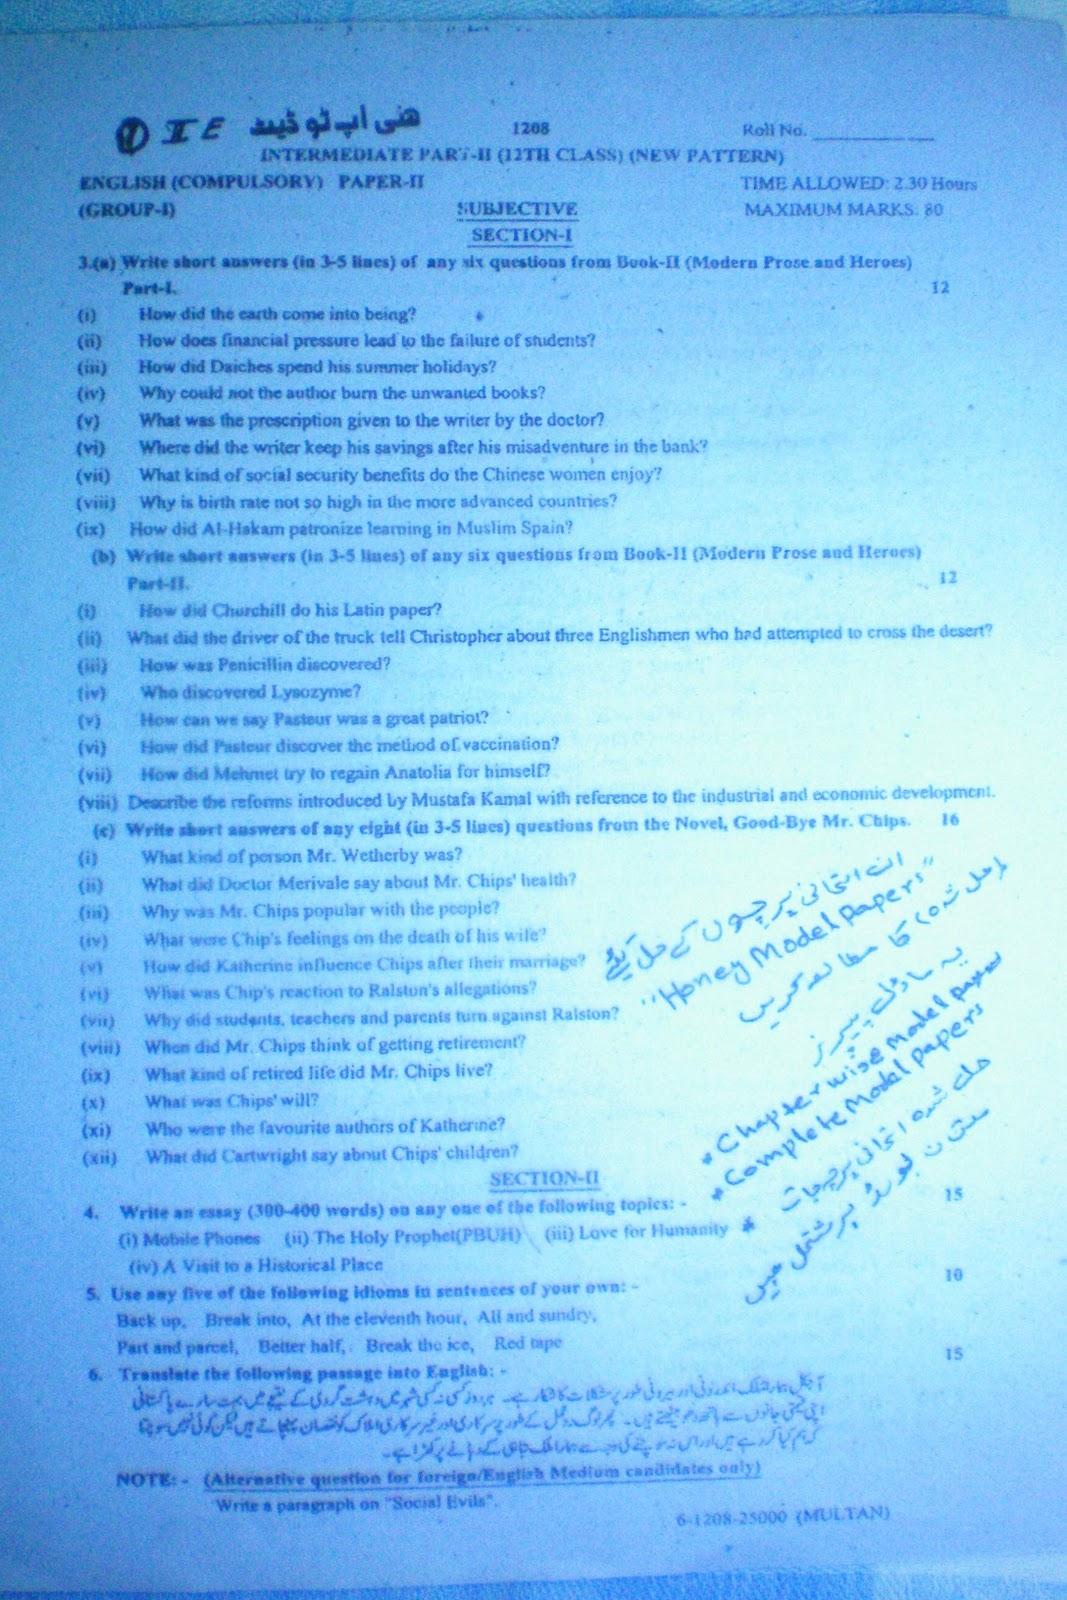 tofel 2010 essay Toefl essay writing topics with answers toefl essay writing topics with answers tribute vacume diag open stuck 2010 odyssey glove box buick trouble code p0303.